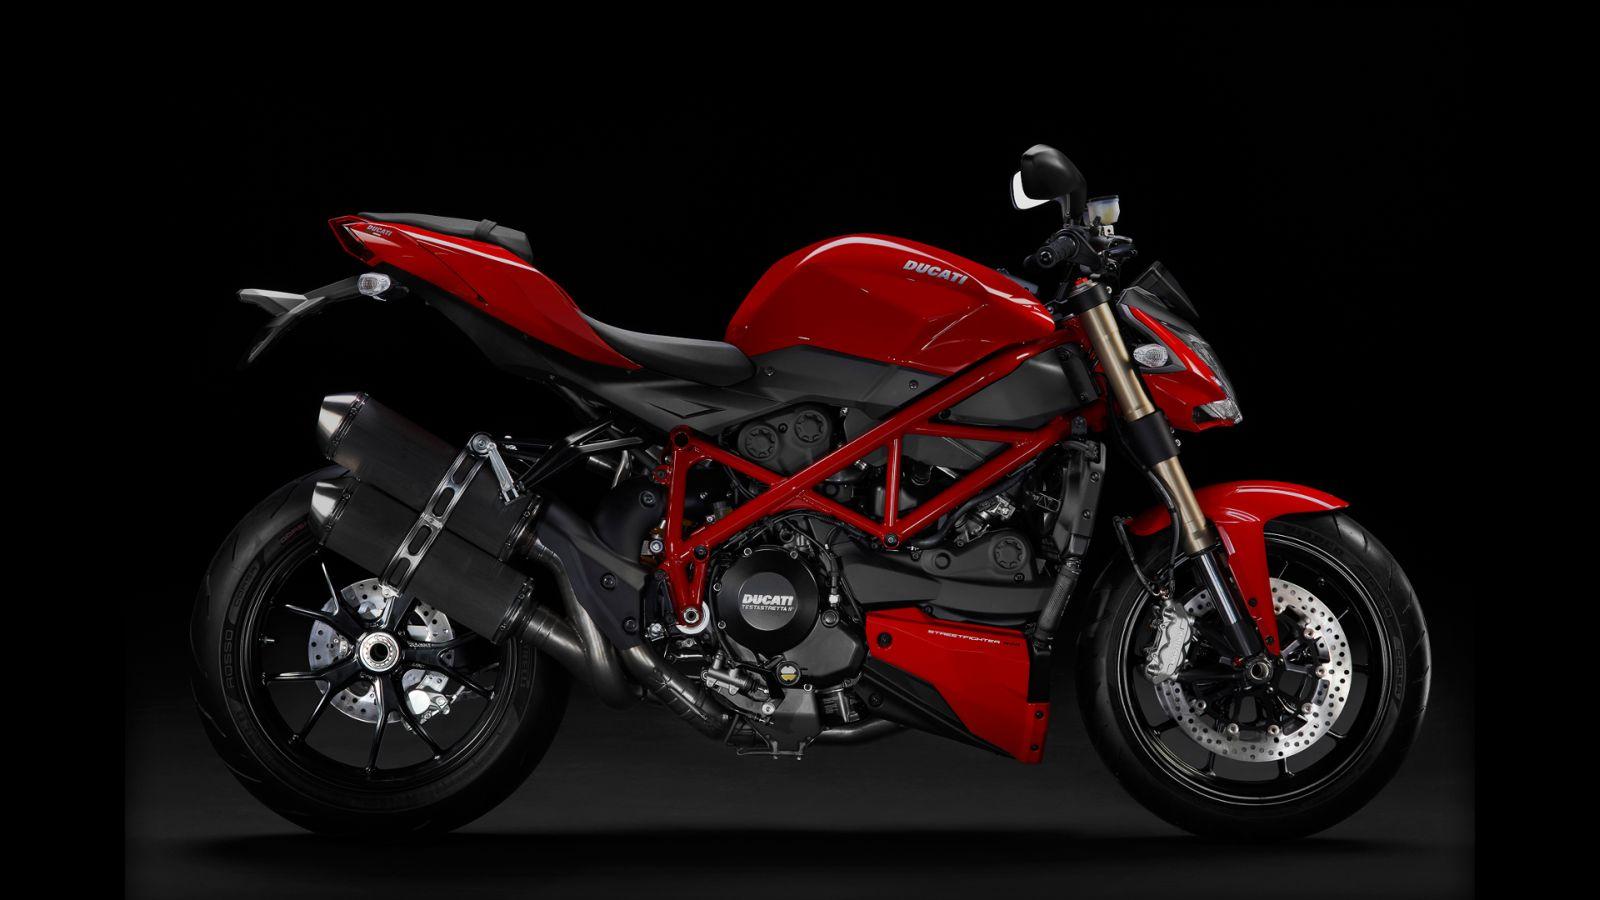 ducati streetfighter 848 2013 bike special